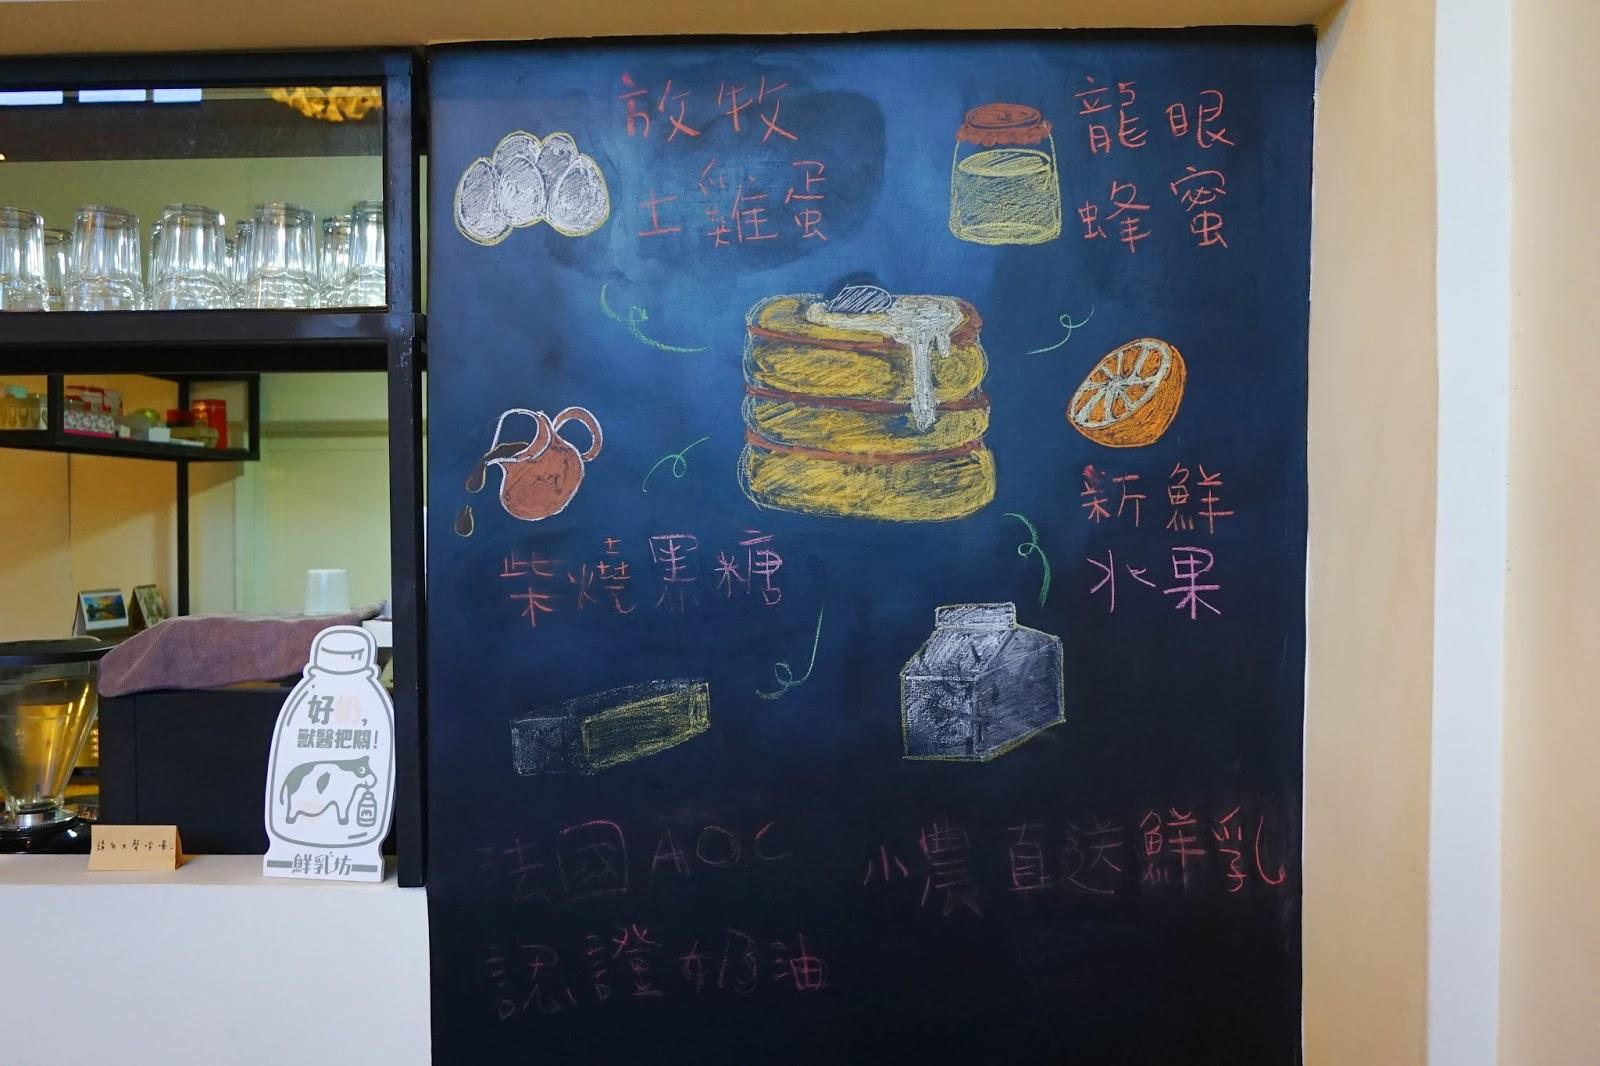 1-hualien-travel-woodstock-pancake-IMG_3611-beautyanxiety.com-hualien-desserts-woodstock-pancake